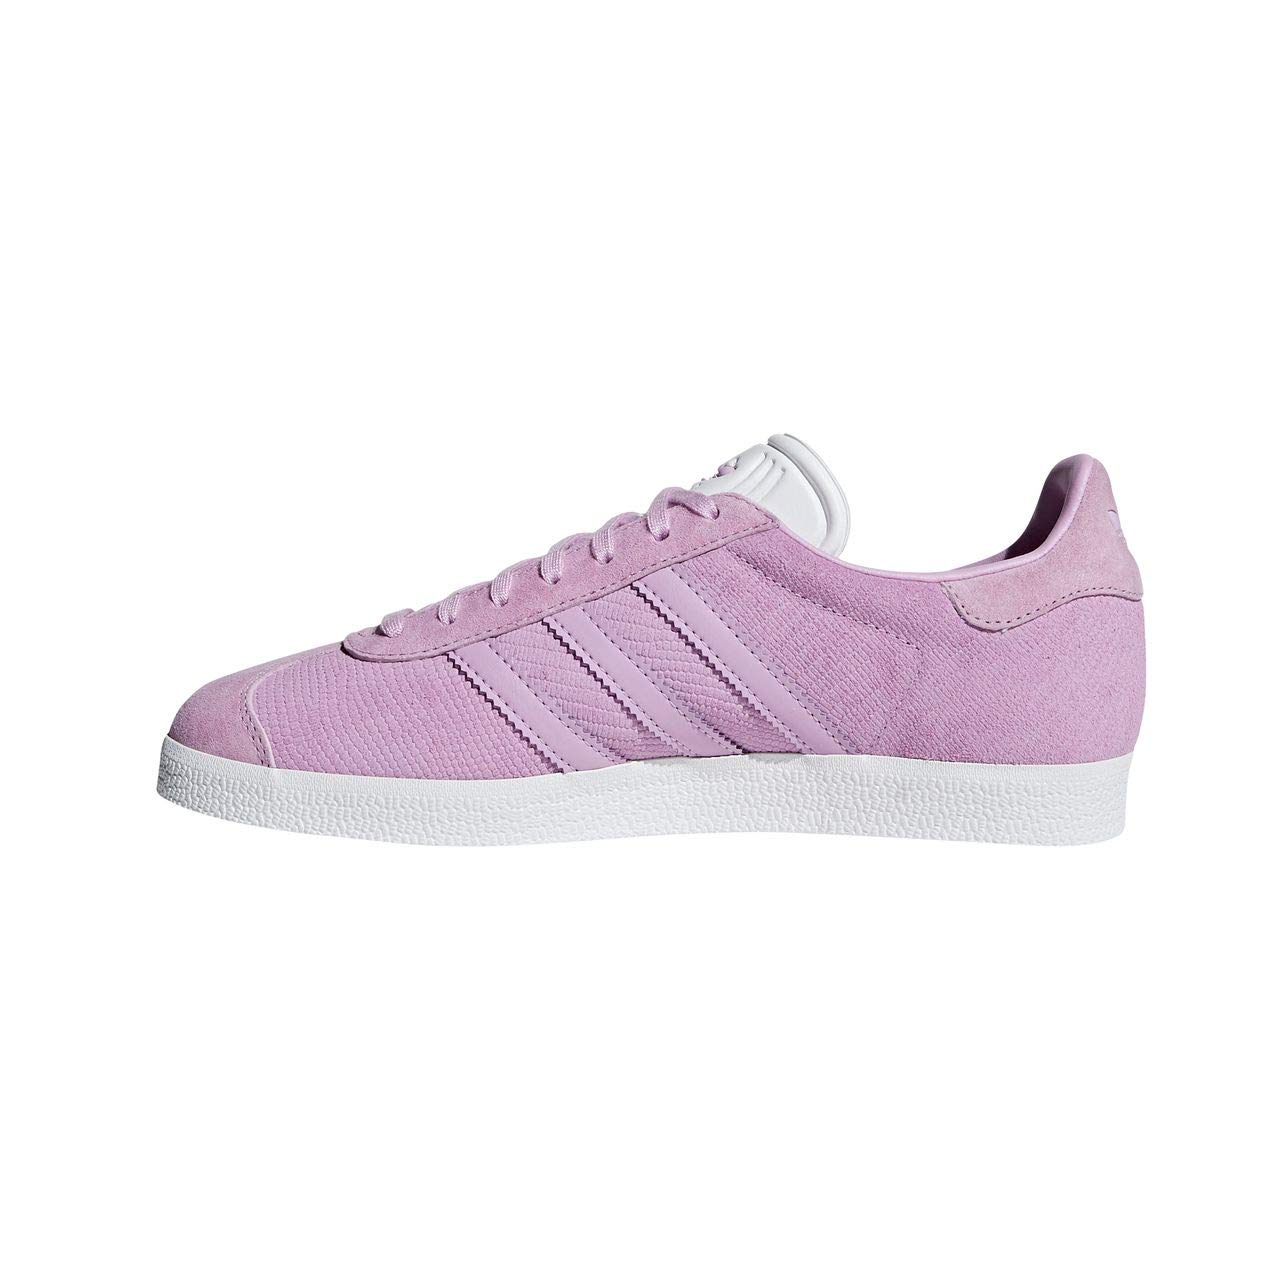 lilat (Lilcla   Lilcla   Ftwbla 0) adidas Damen Gazelle W Gymnastikschuhe, grau, Eu